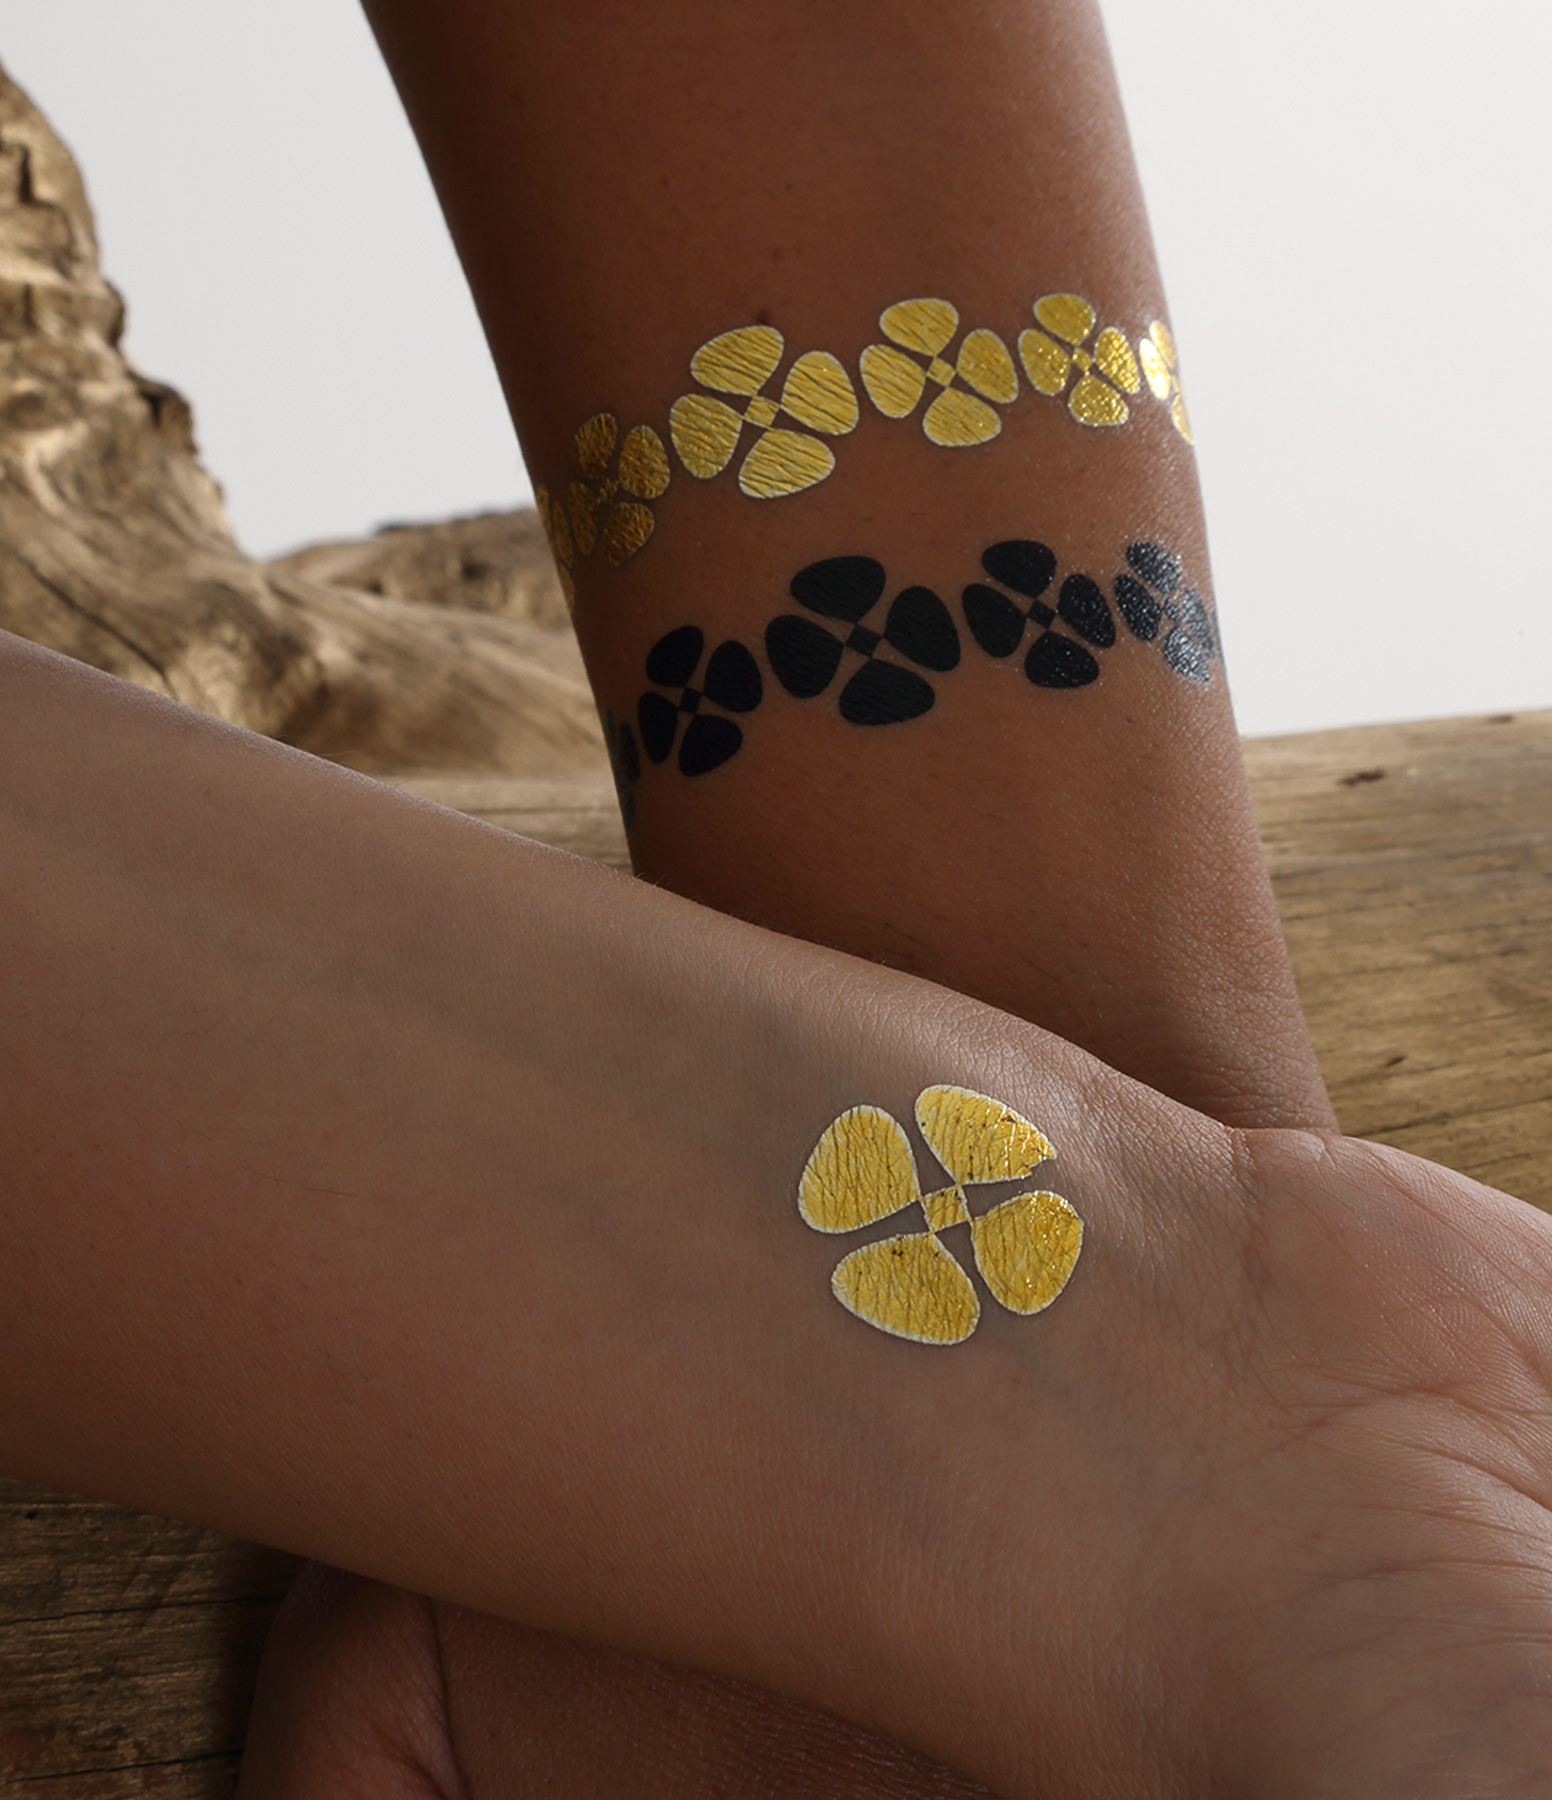 Tattoo Lulli - LULLI